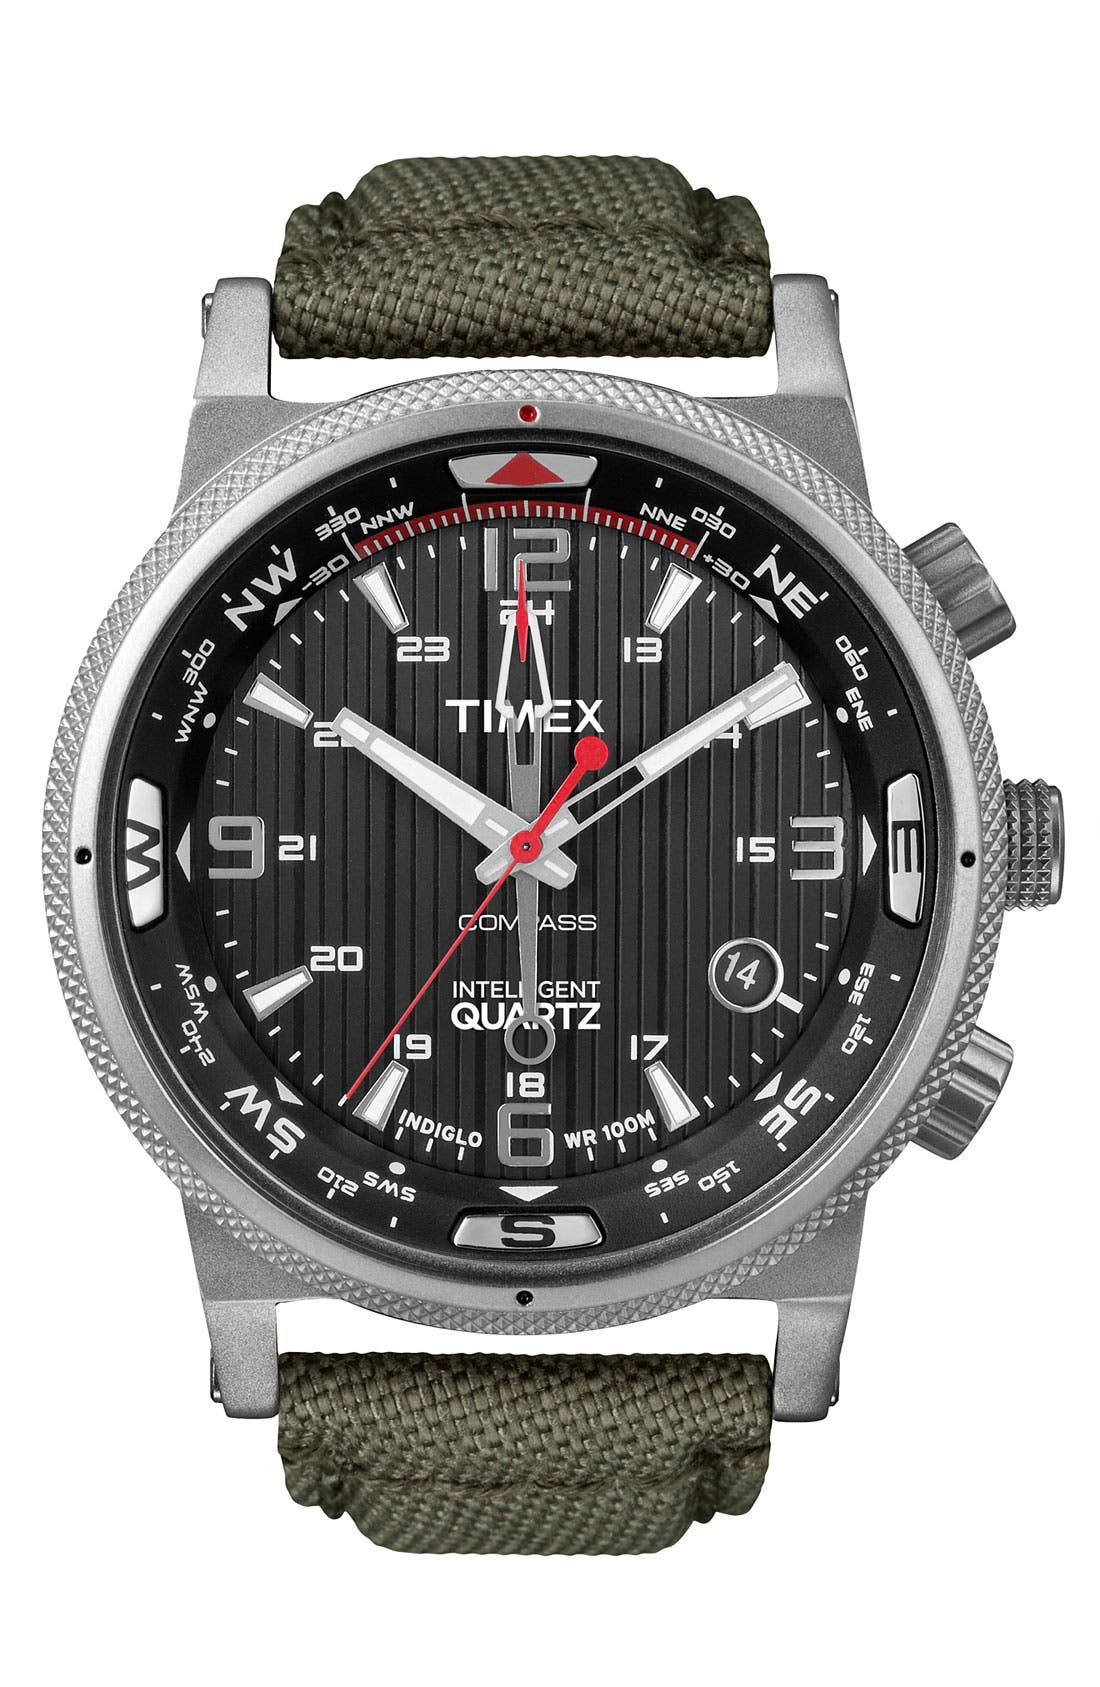 Main Image - Timex® 'Intelligent Quartz' Compass Dial Watch